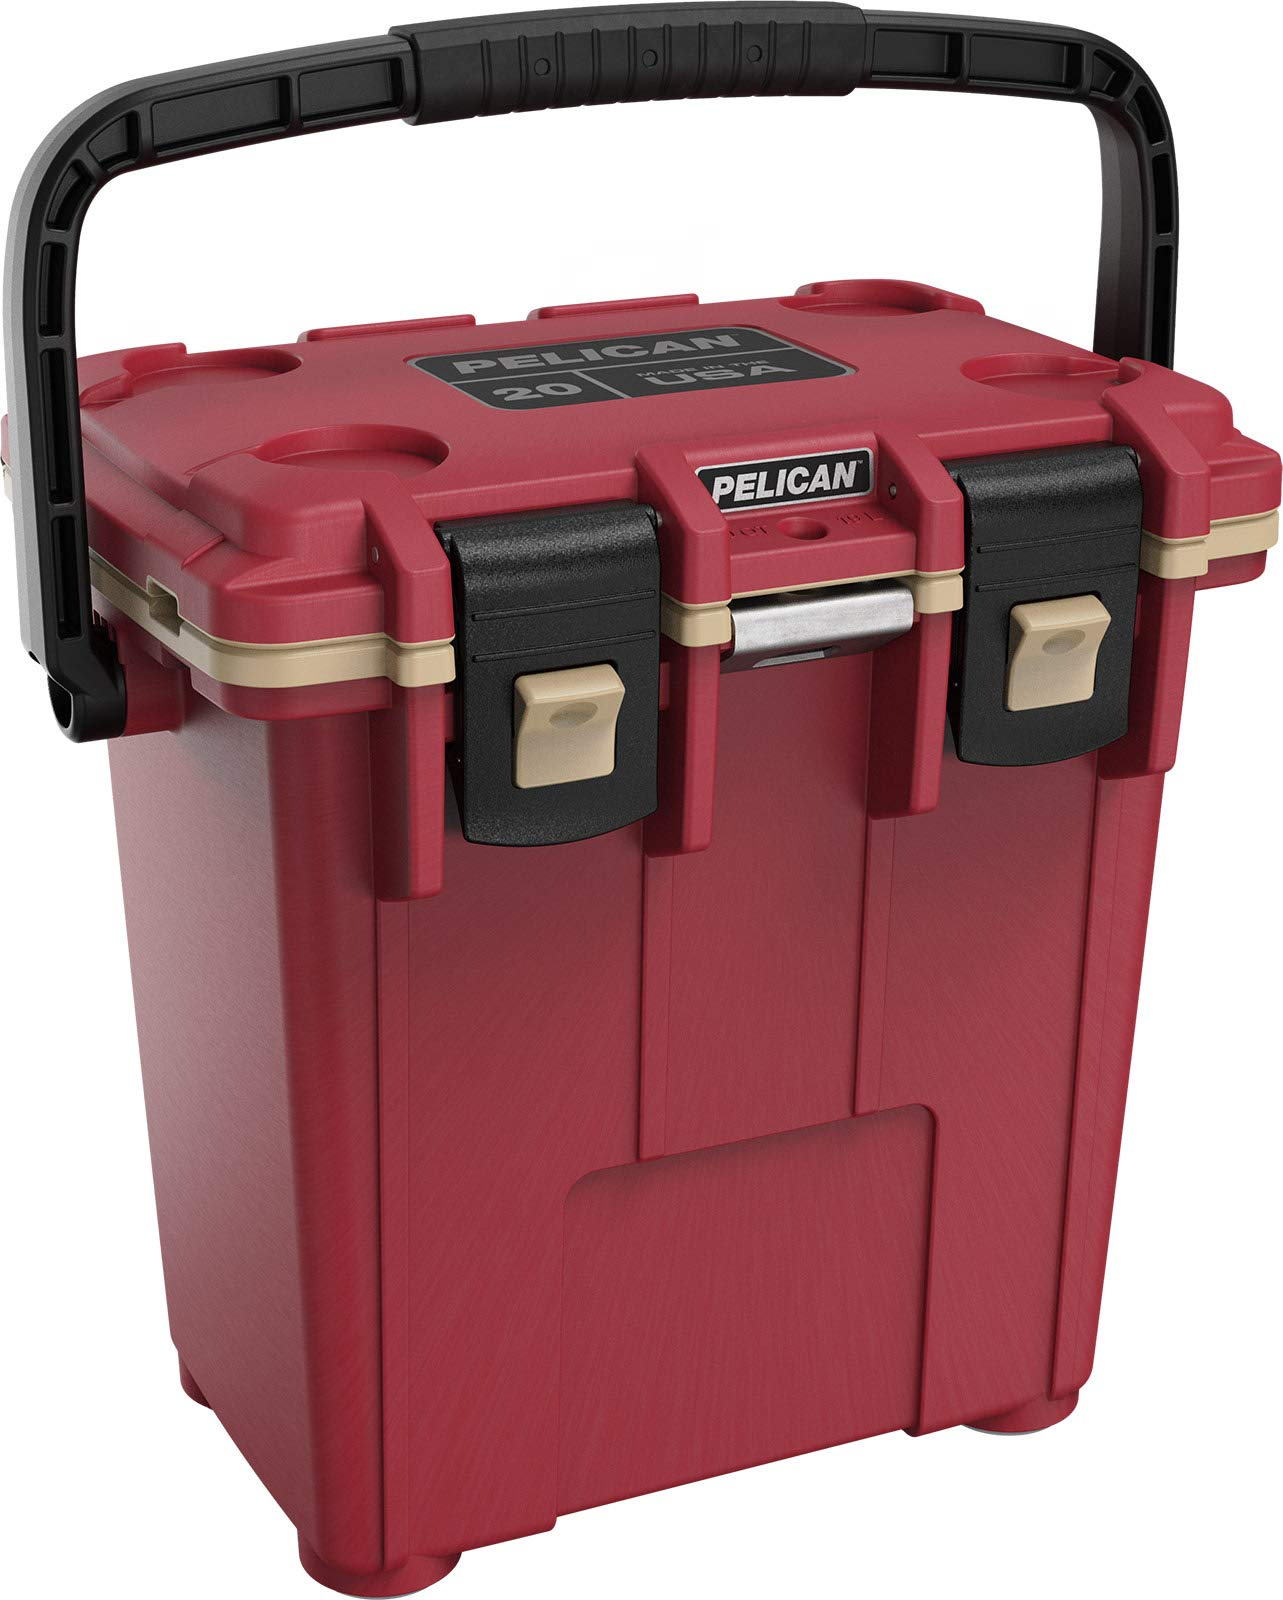 Pelican Elite 20 Quart Cooler (Canyon Red/Coyote)